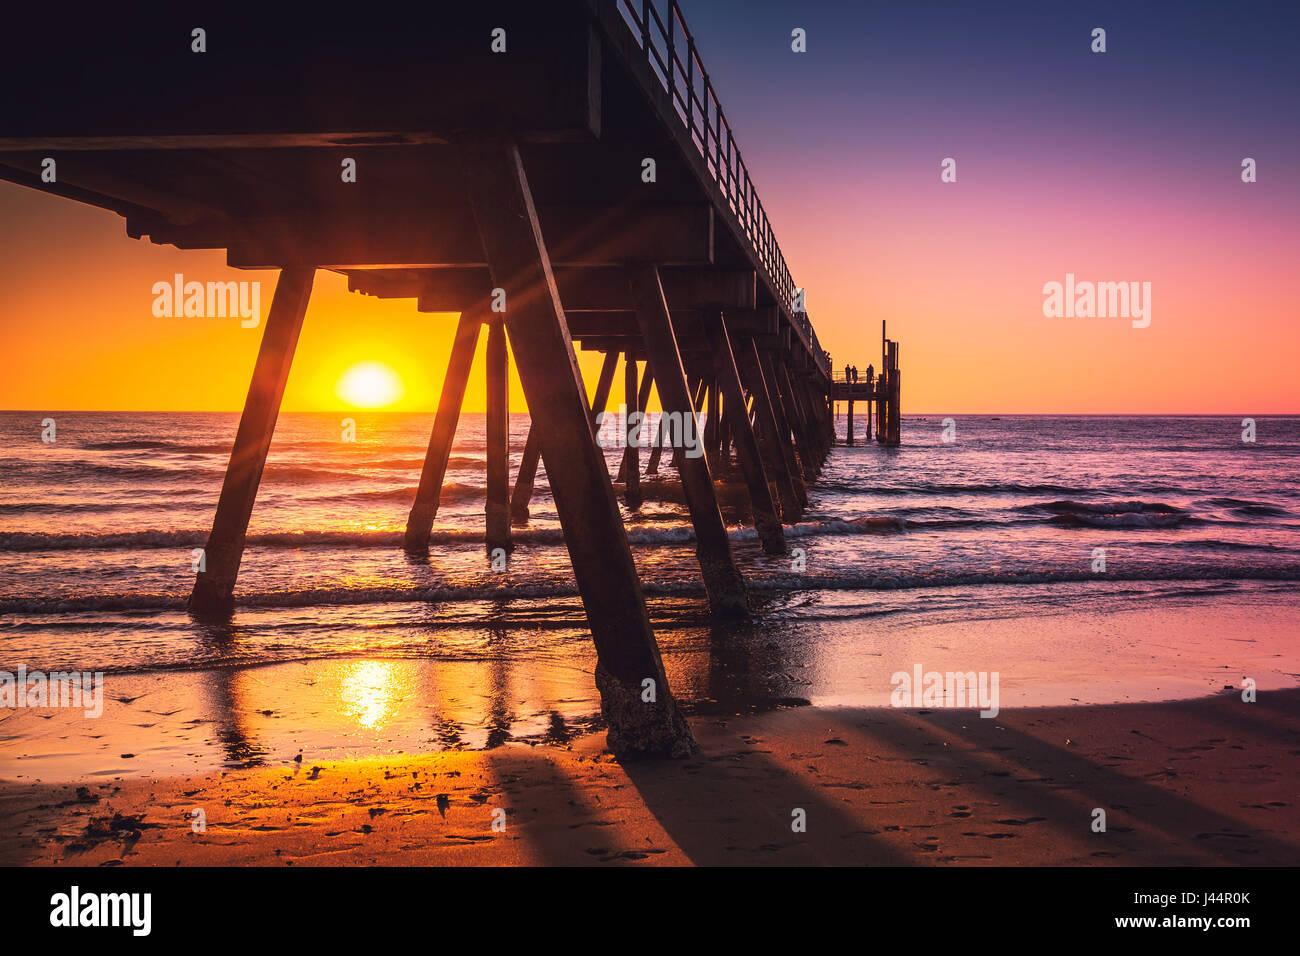 Glenelg beach jetty at sunset, Adelaide, South Australia - Stock Image